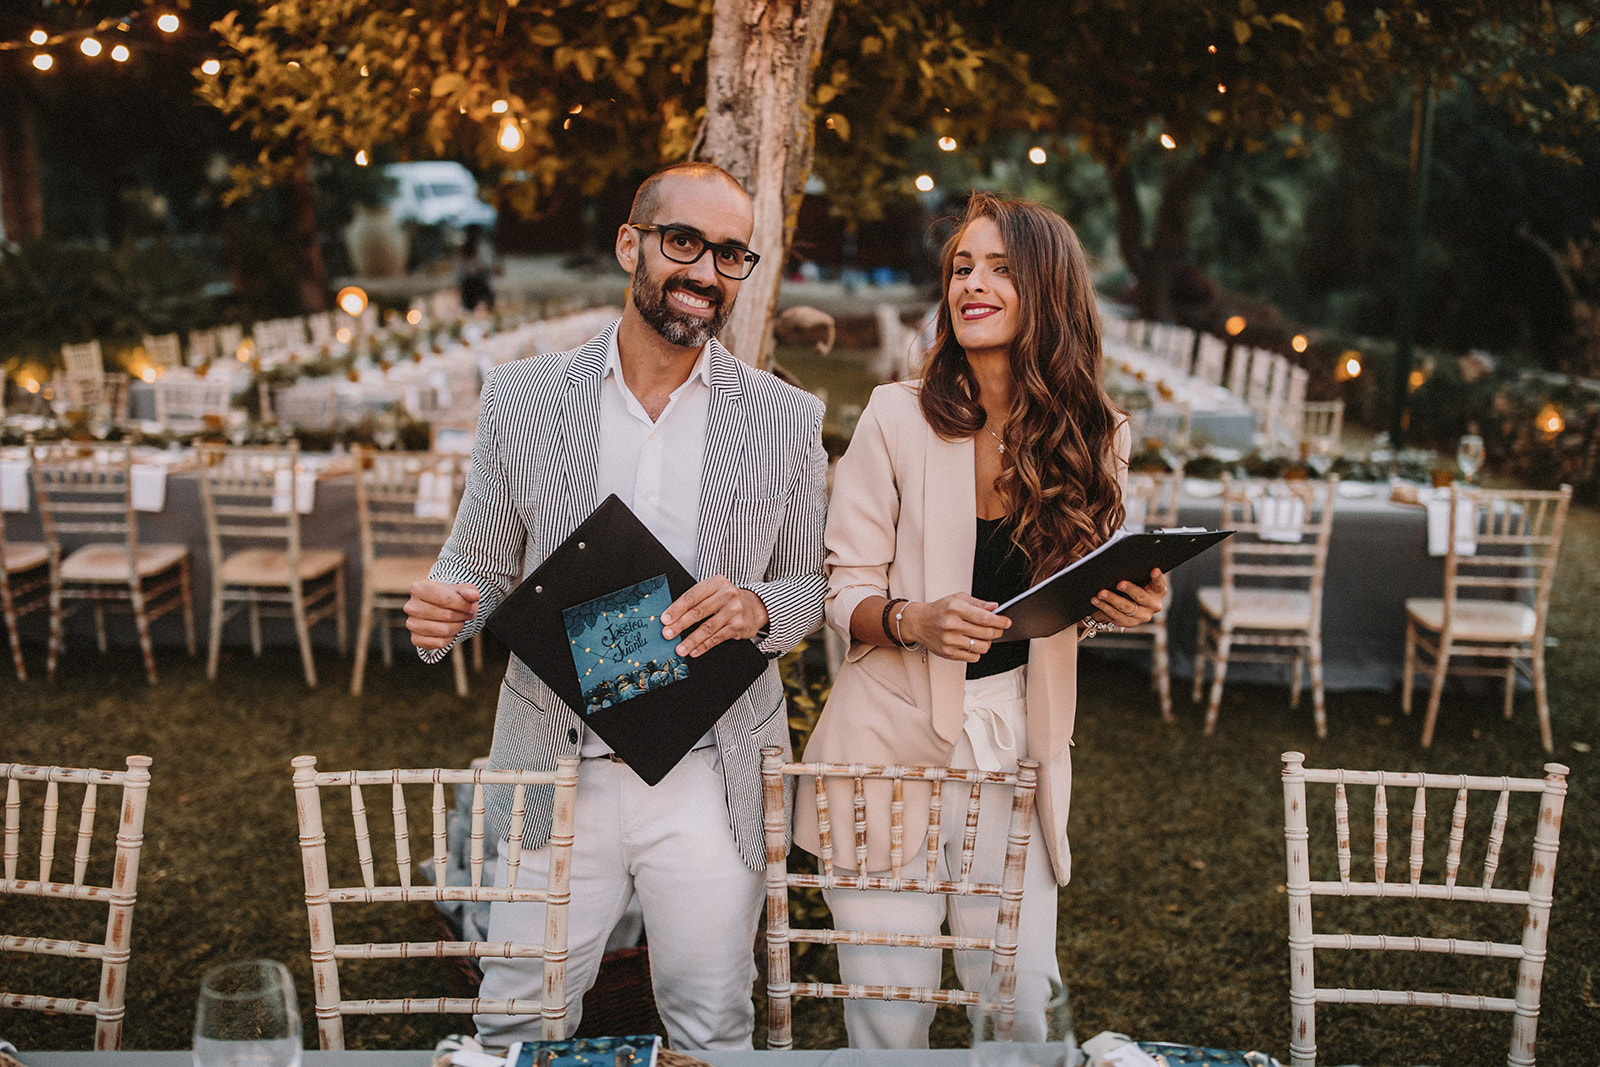 Somos Oheme, organizadores de bodas desde 2012 - Aroha y Fran